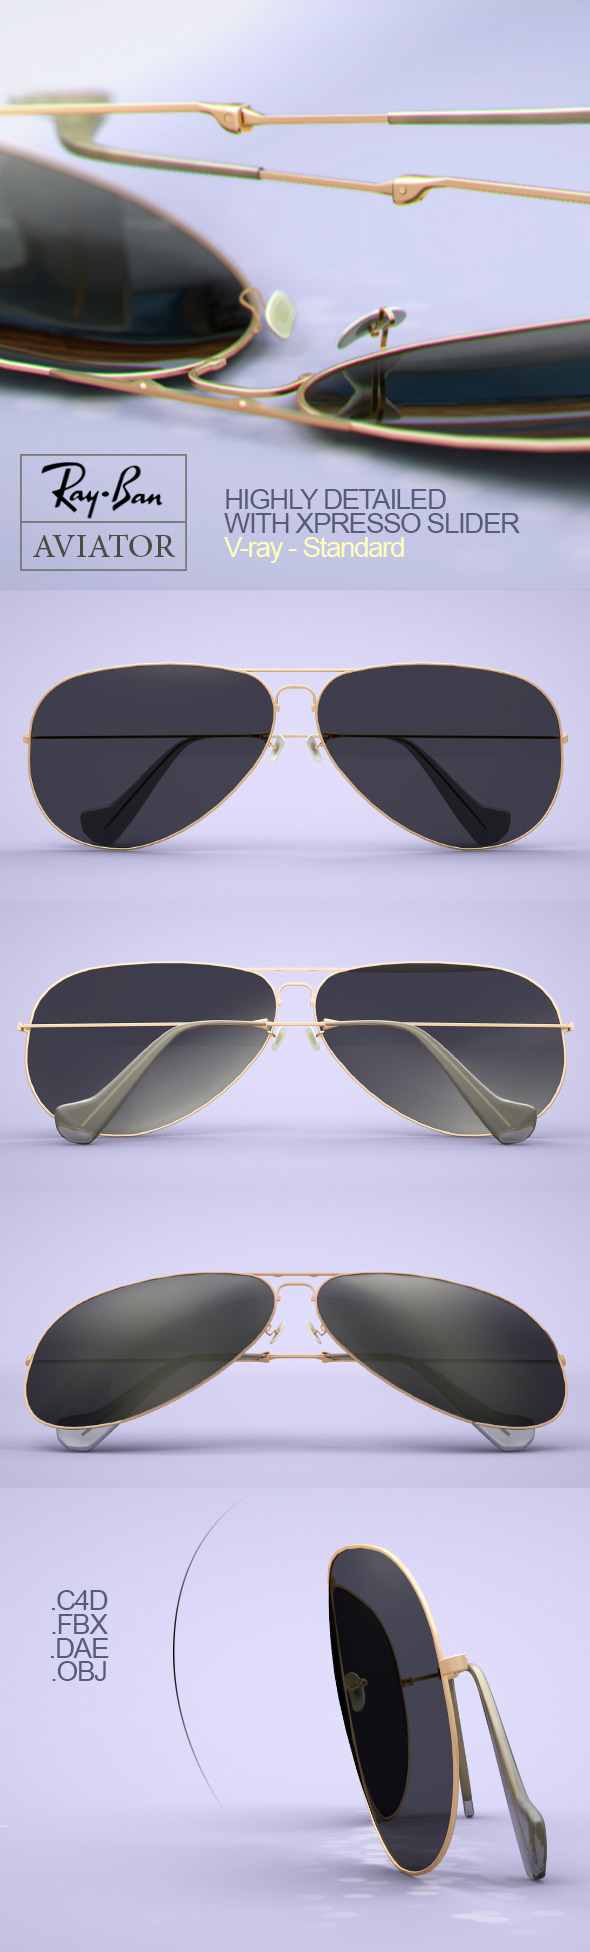 3DOcean Rayban Aviator Sunglasses 10774810